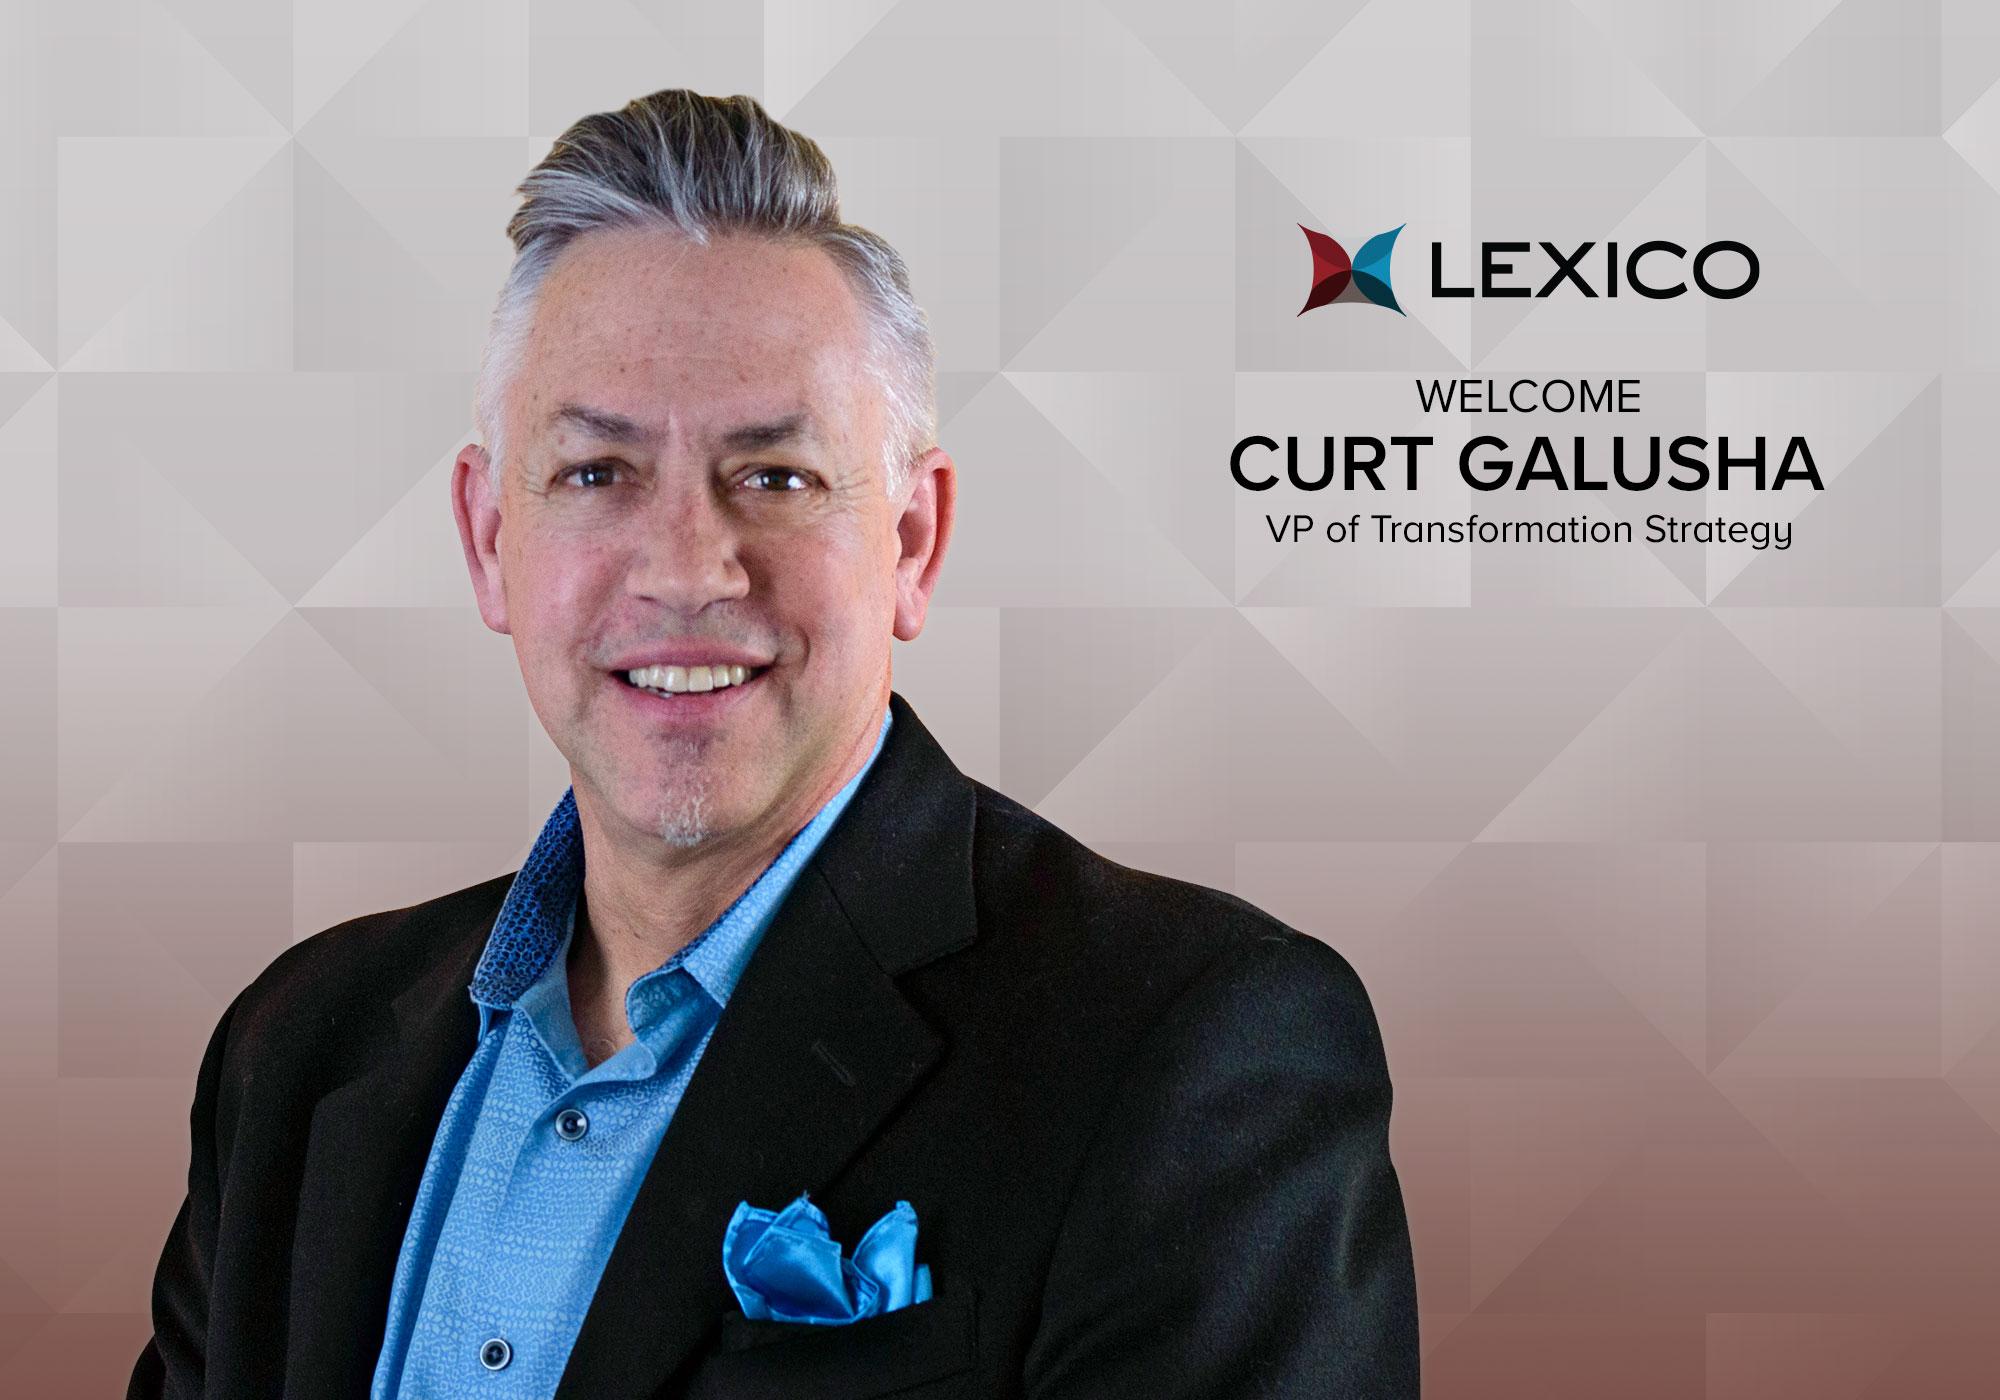 Curt Galusha, VP of Transformation Strategy, Lexico